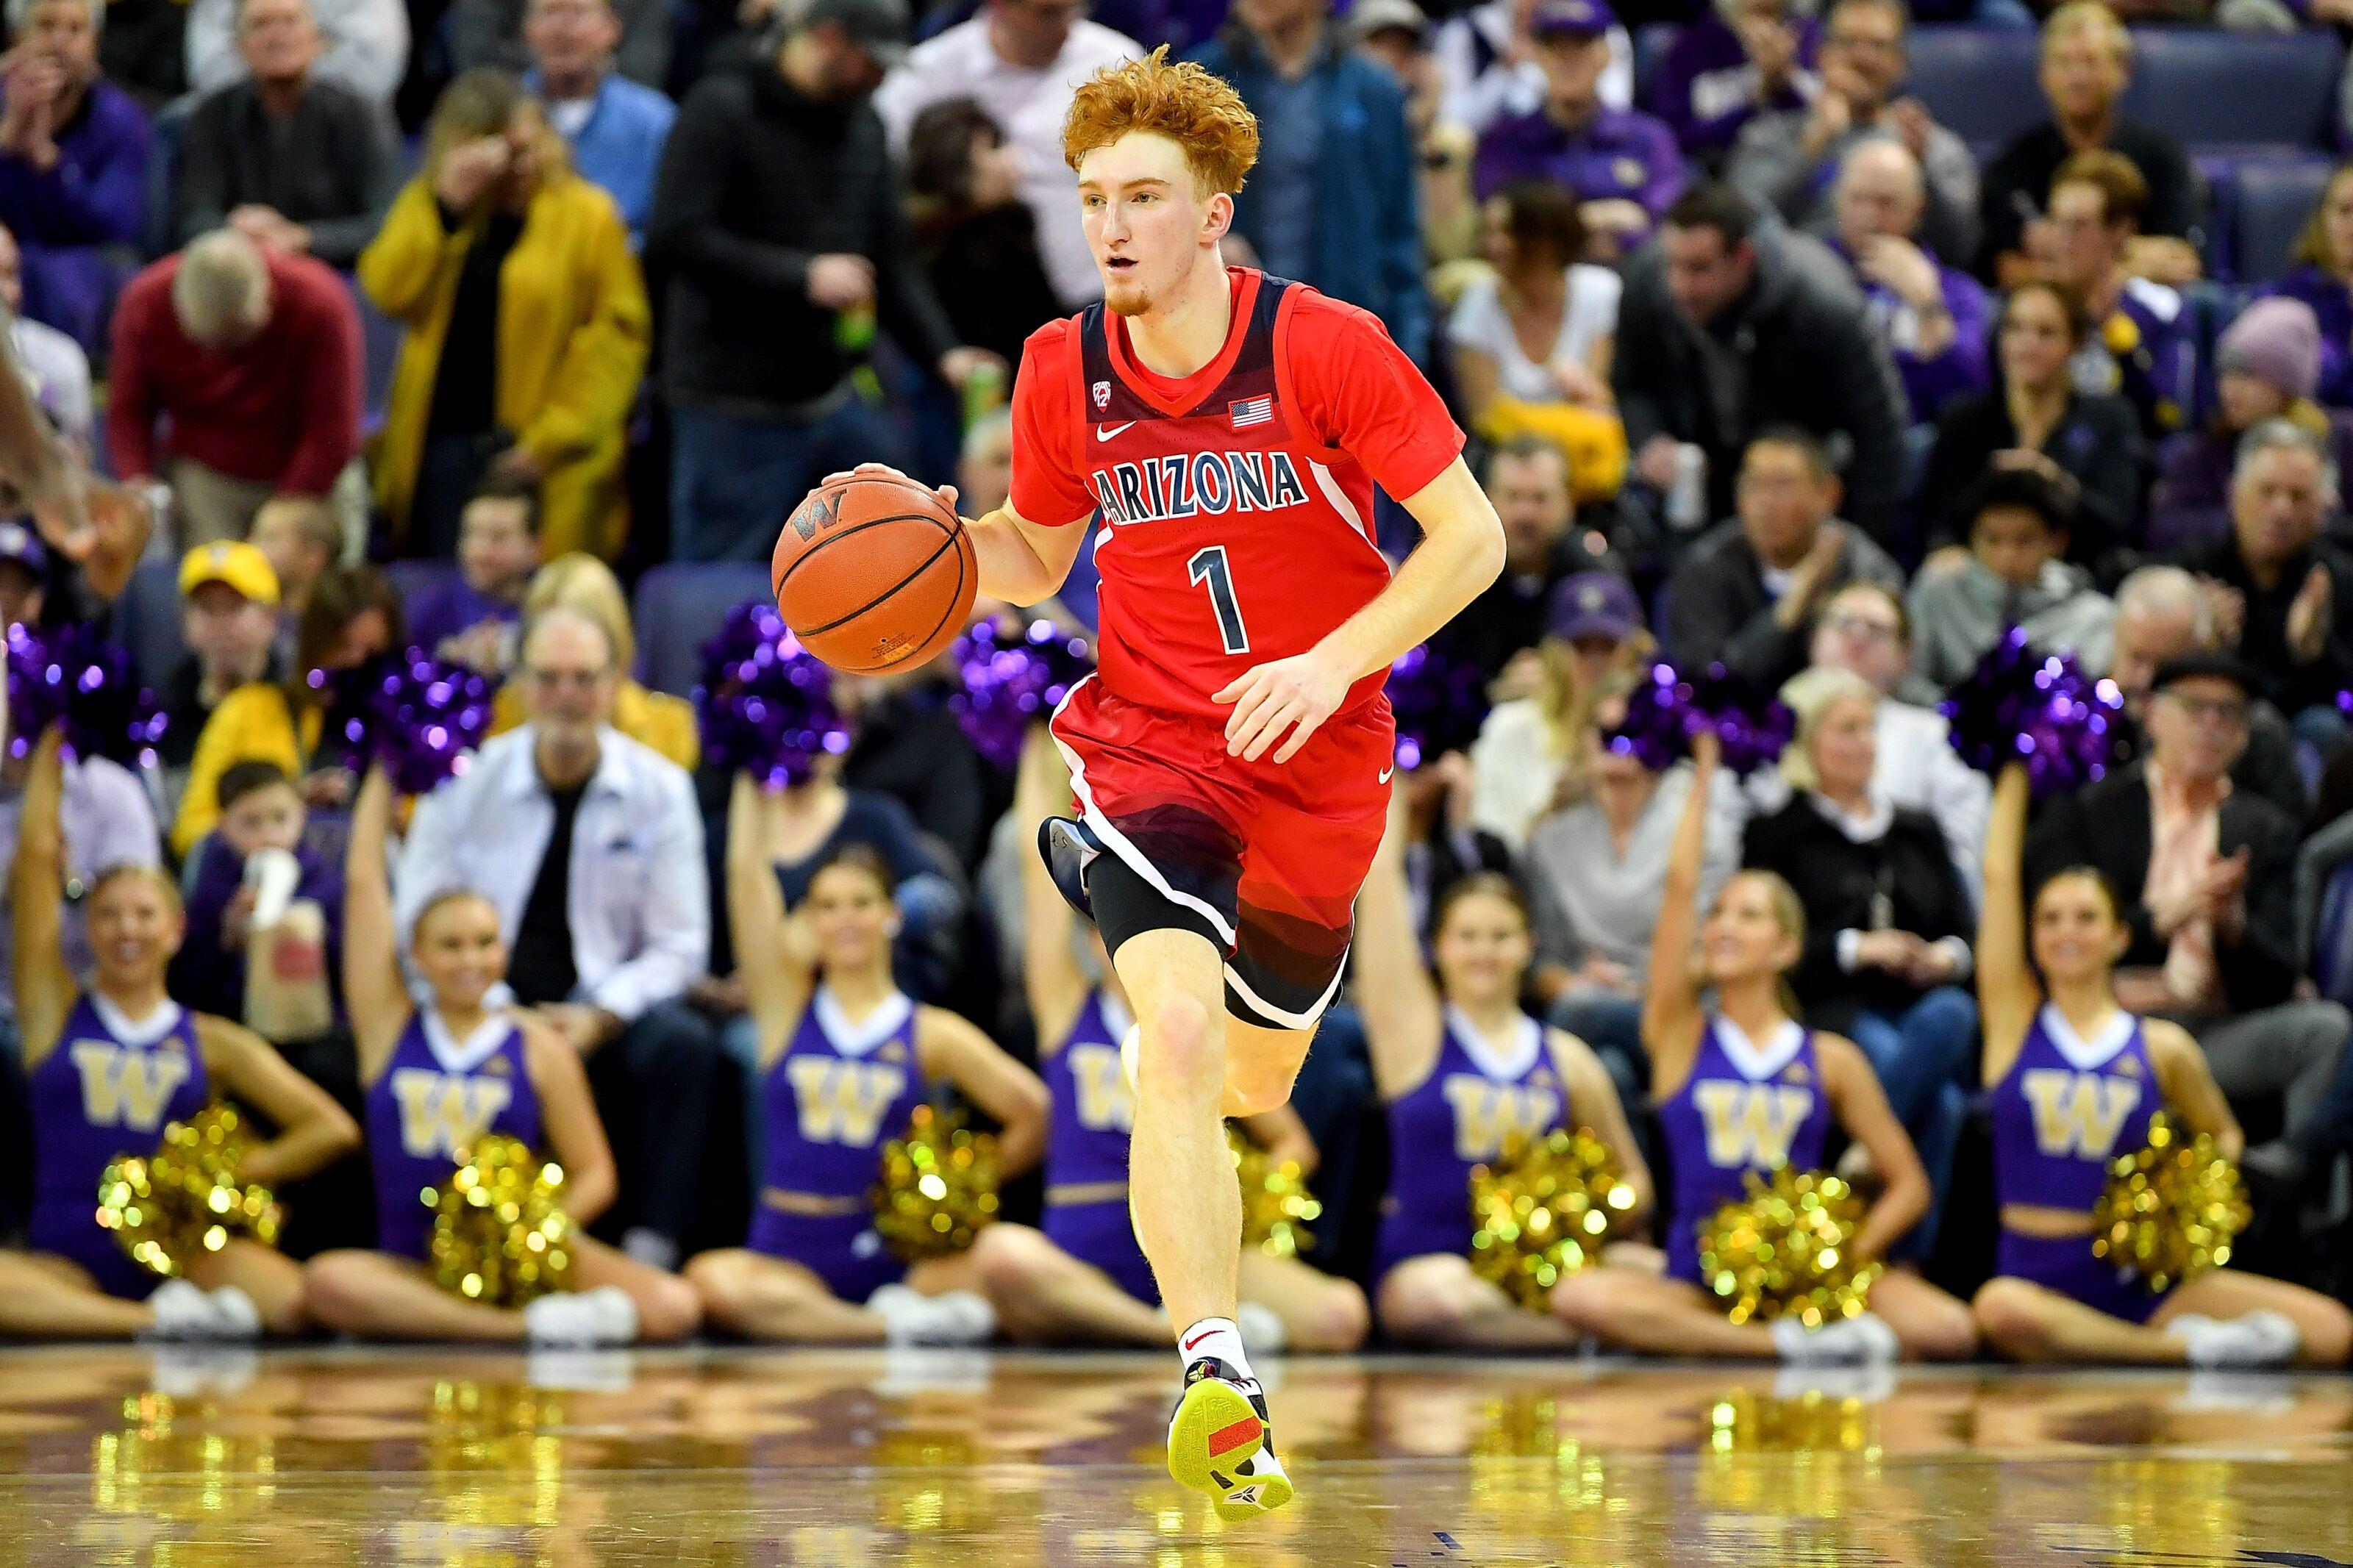 Arizona Basketball: Deandre Ayton and Nico Mannion, future teammates?